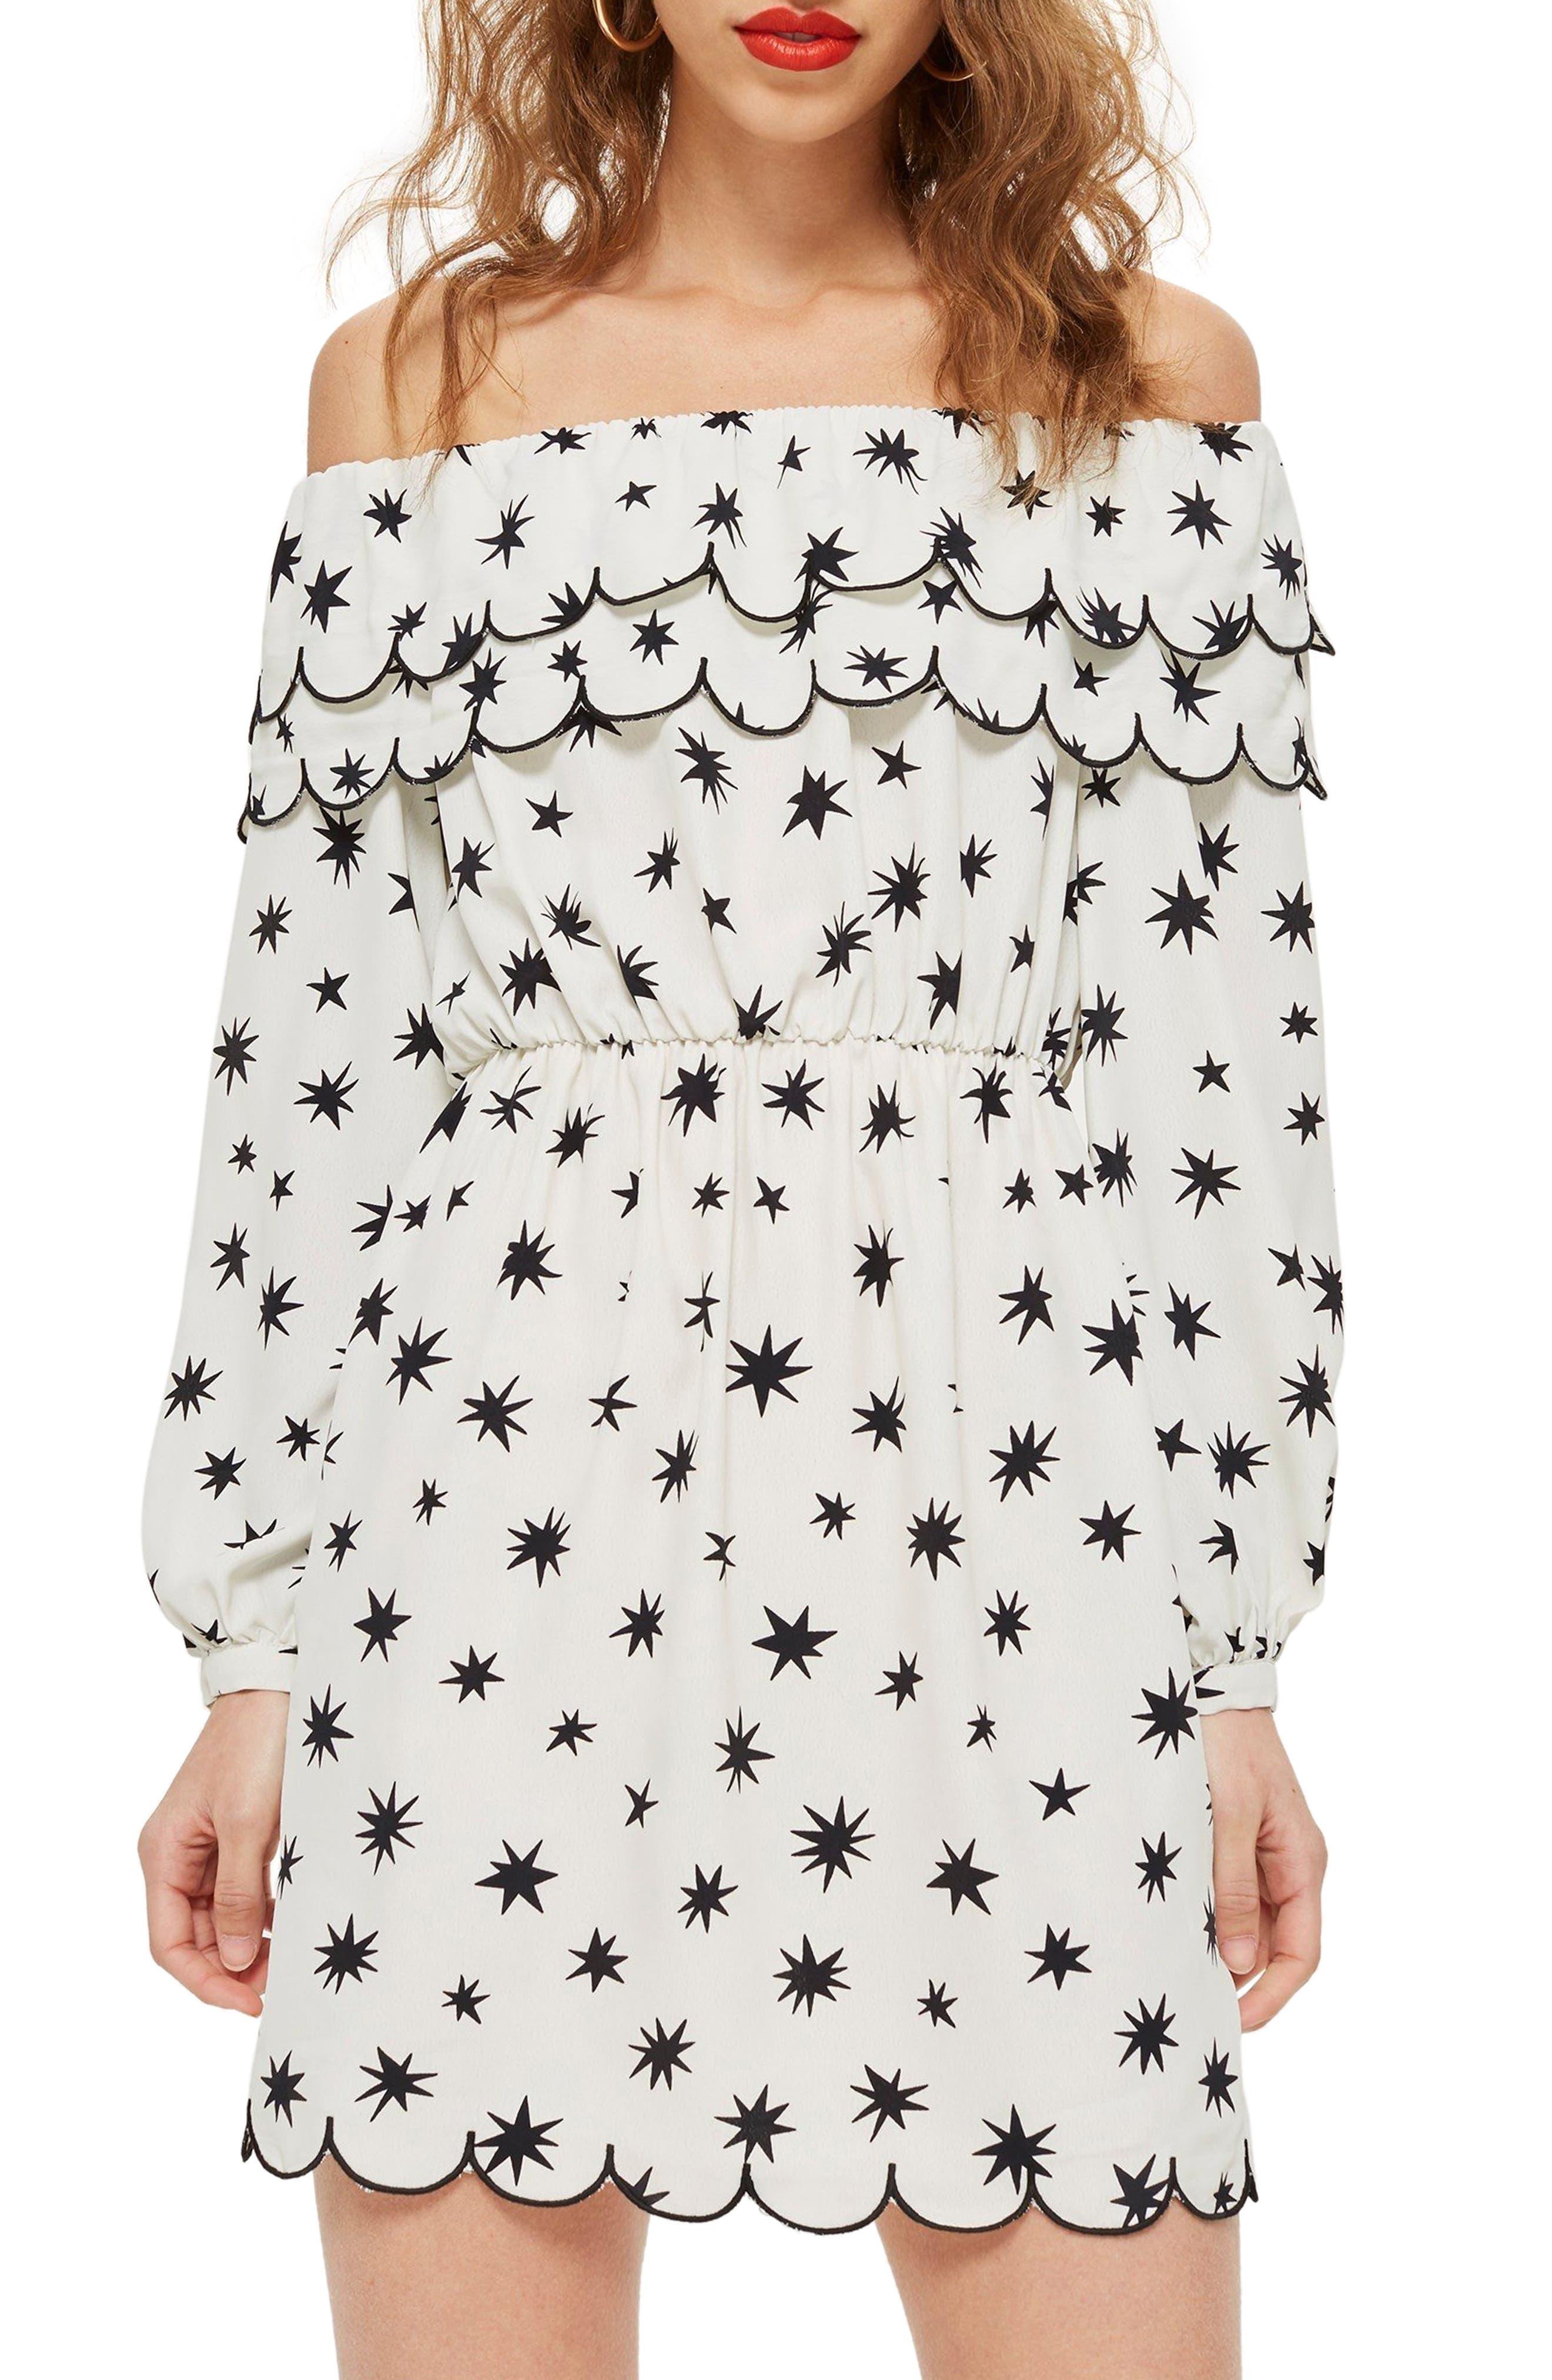 Scallop Star Off the Shoulder Dress,                         Main,                         color, 100